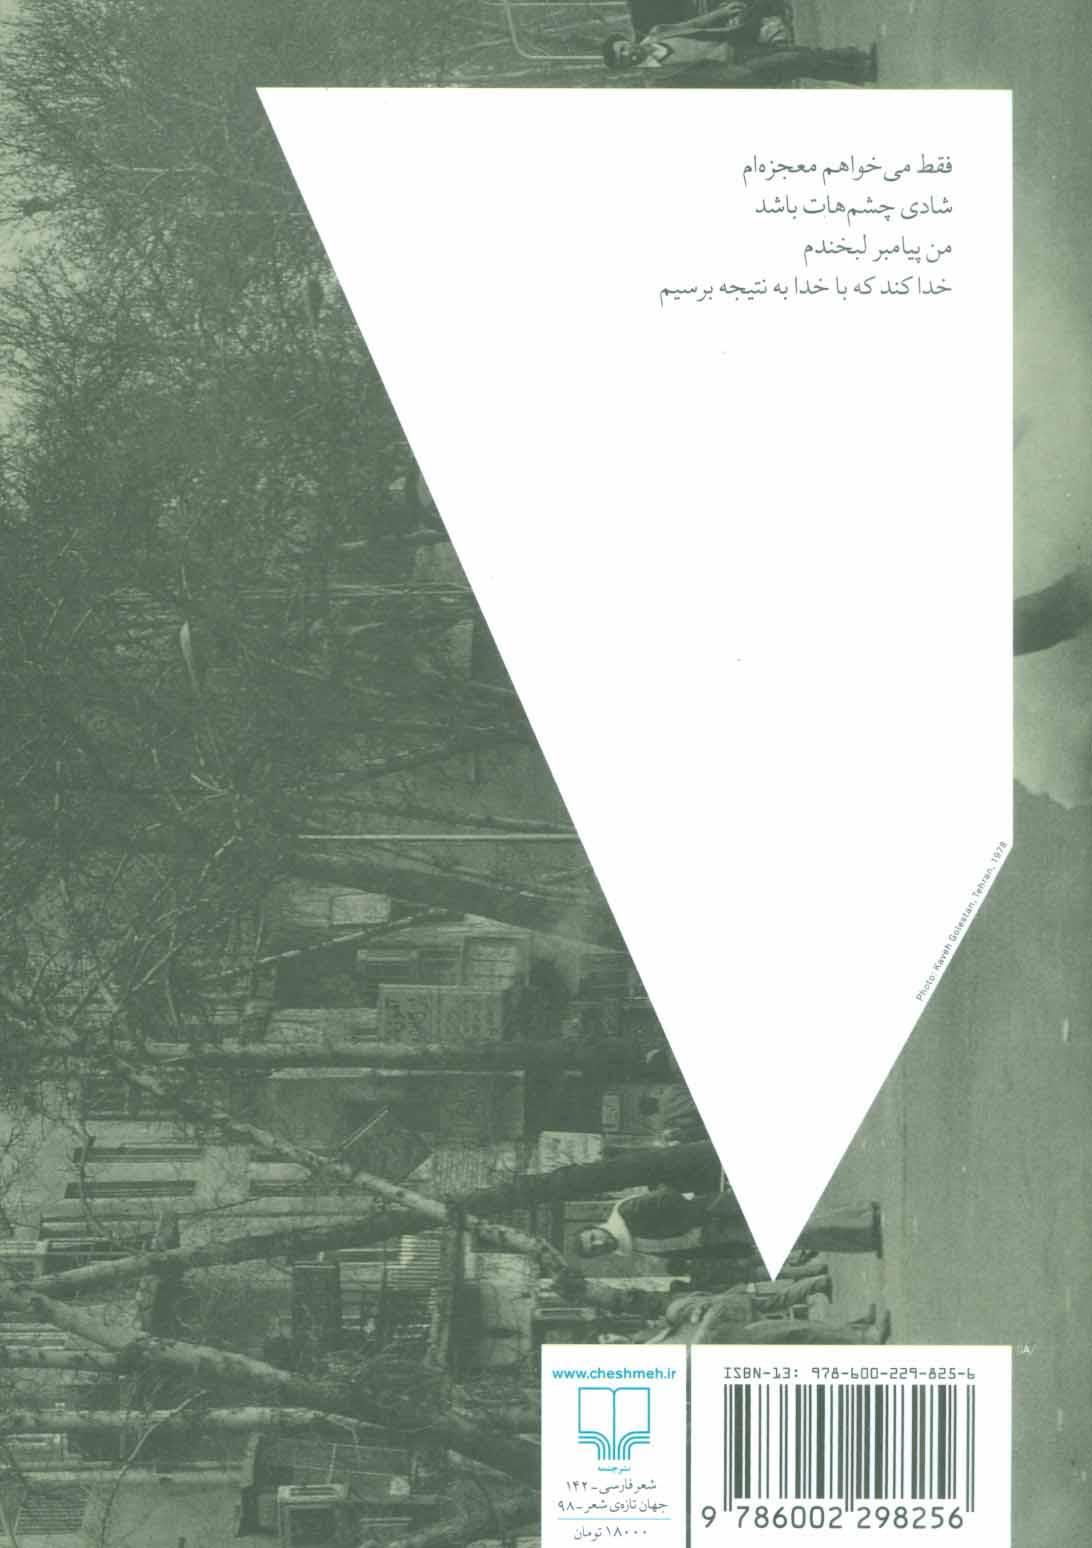 اسکارلت دهه ی شصت:مجموعه شعر (جهان تازه ی شعر98)